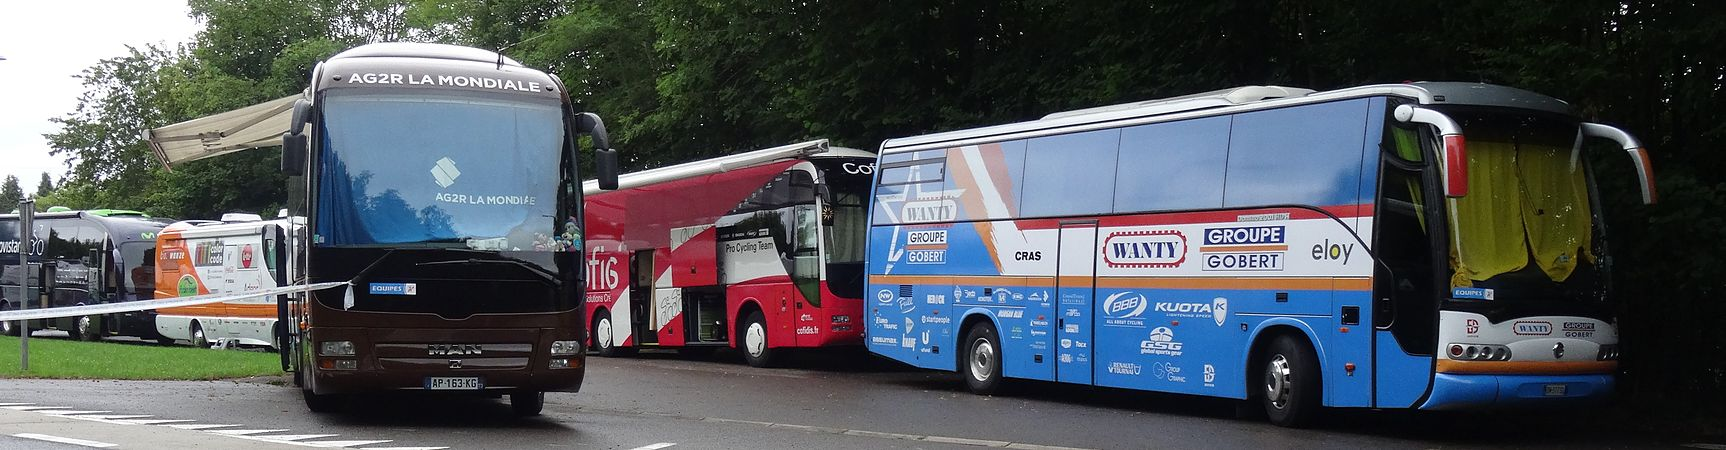 Neufchâteau - Tour de Wallonie, étape 3, 28 juillet 2014, arrivée (B06).JPG